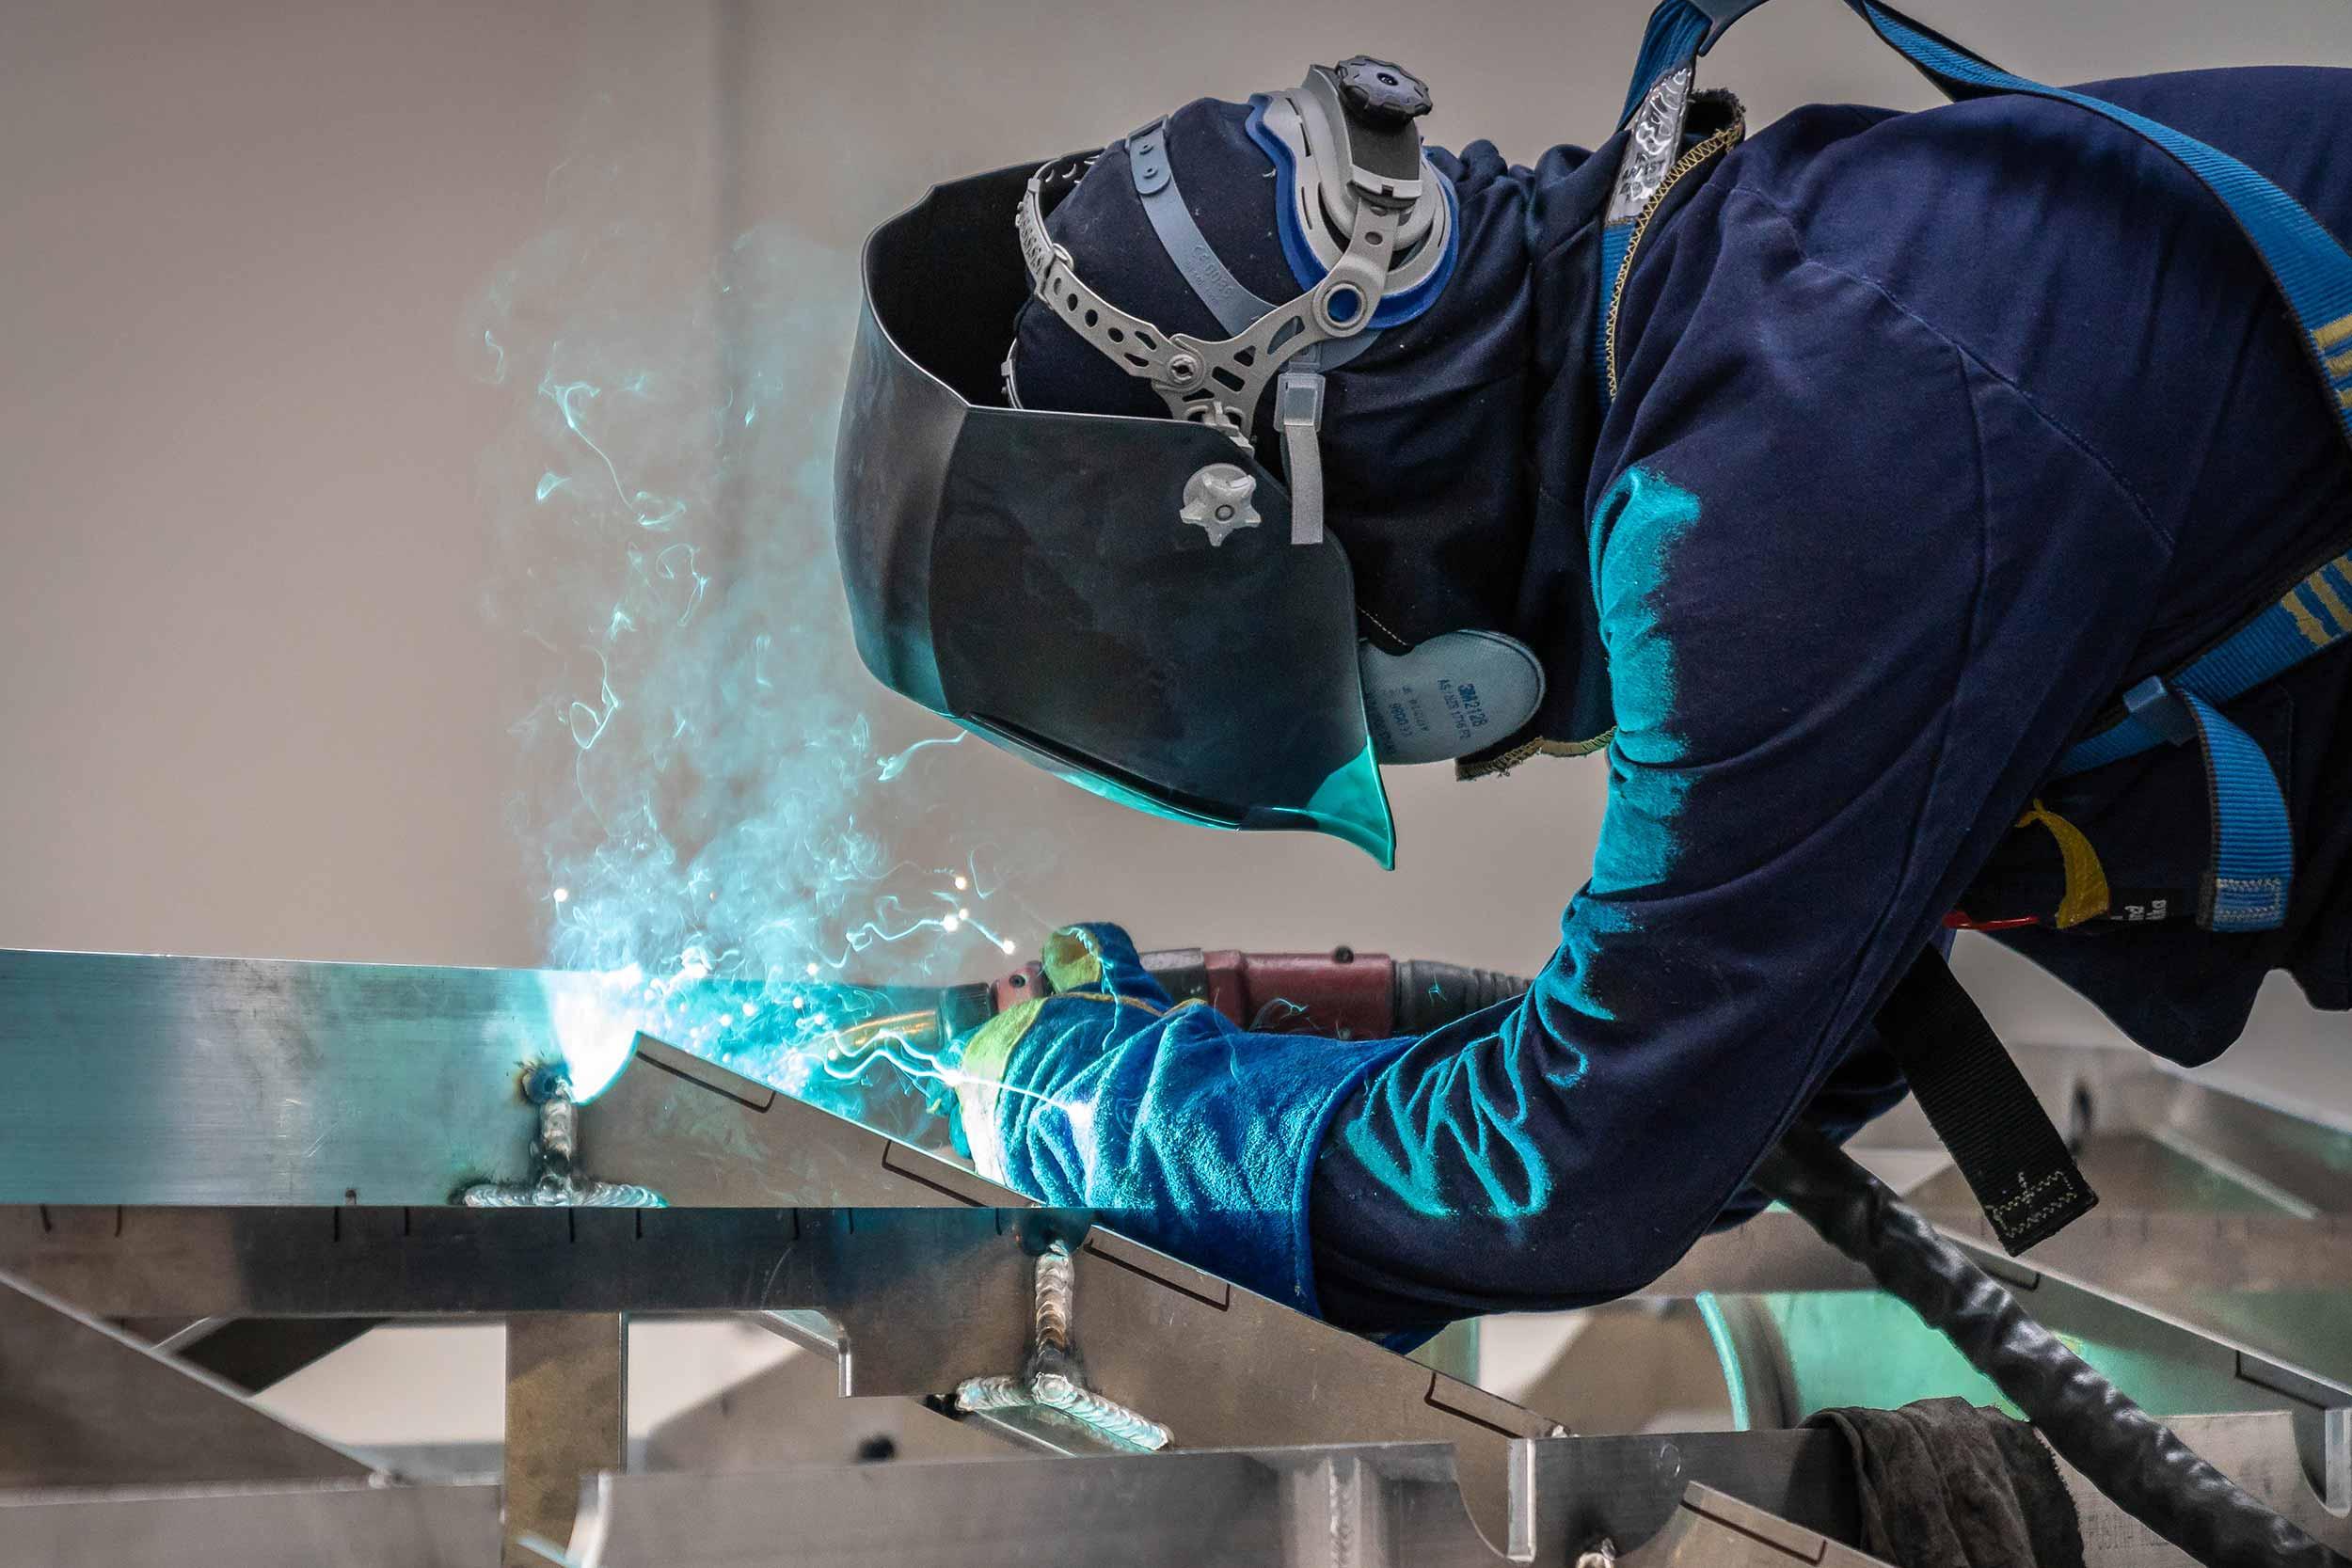 Dickey Boats welding roles